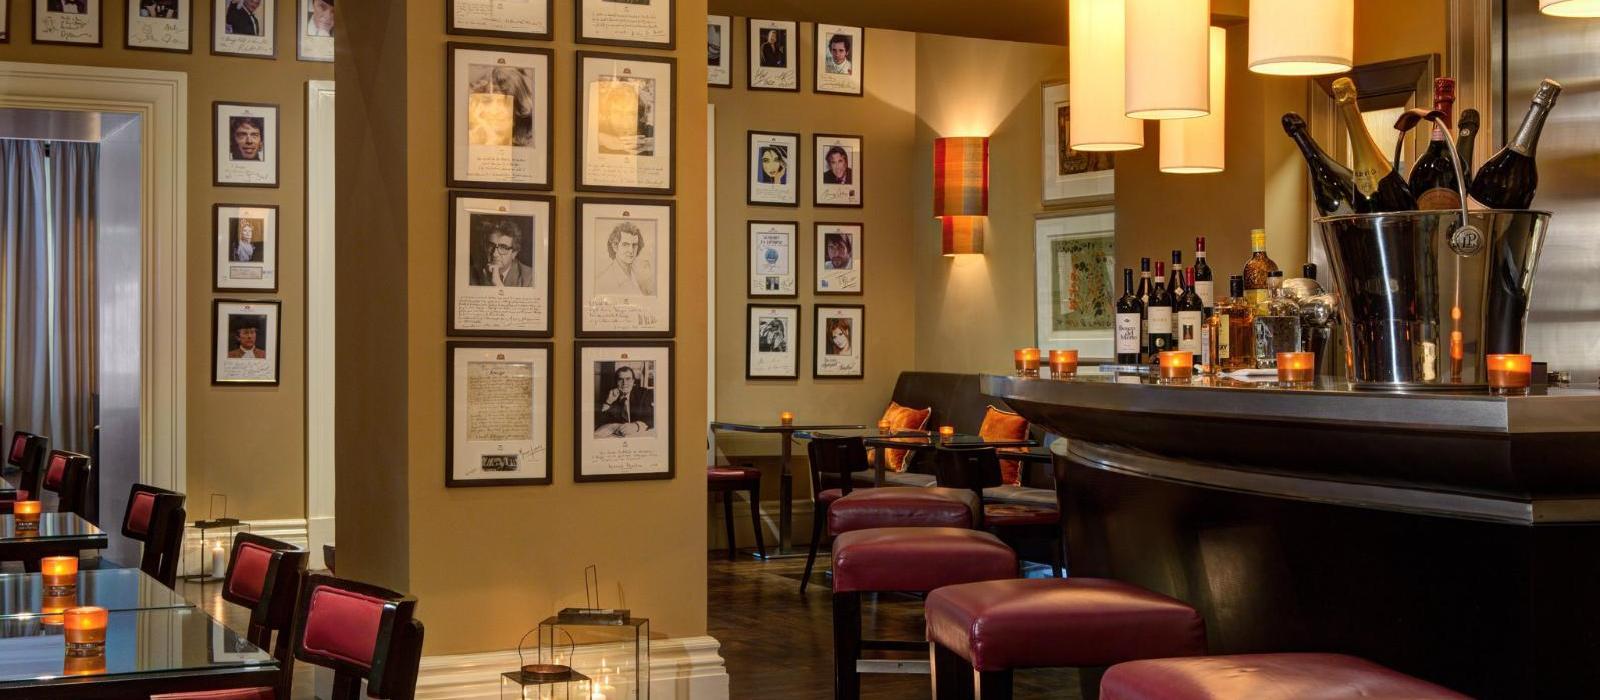 洛克福特阿米戈豪华酒店(Rocco Forte Hotel Amigo) 图片  www.lhw.cn